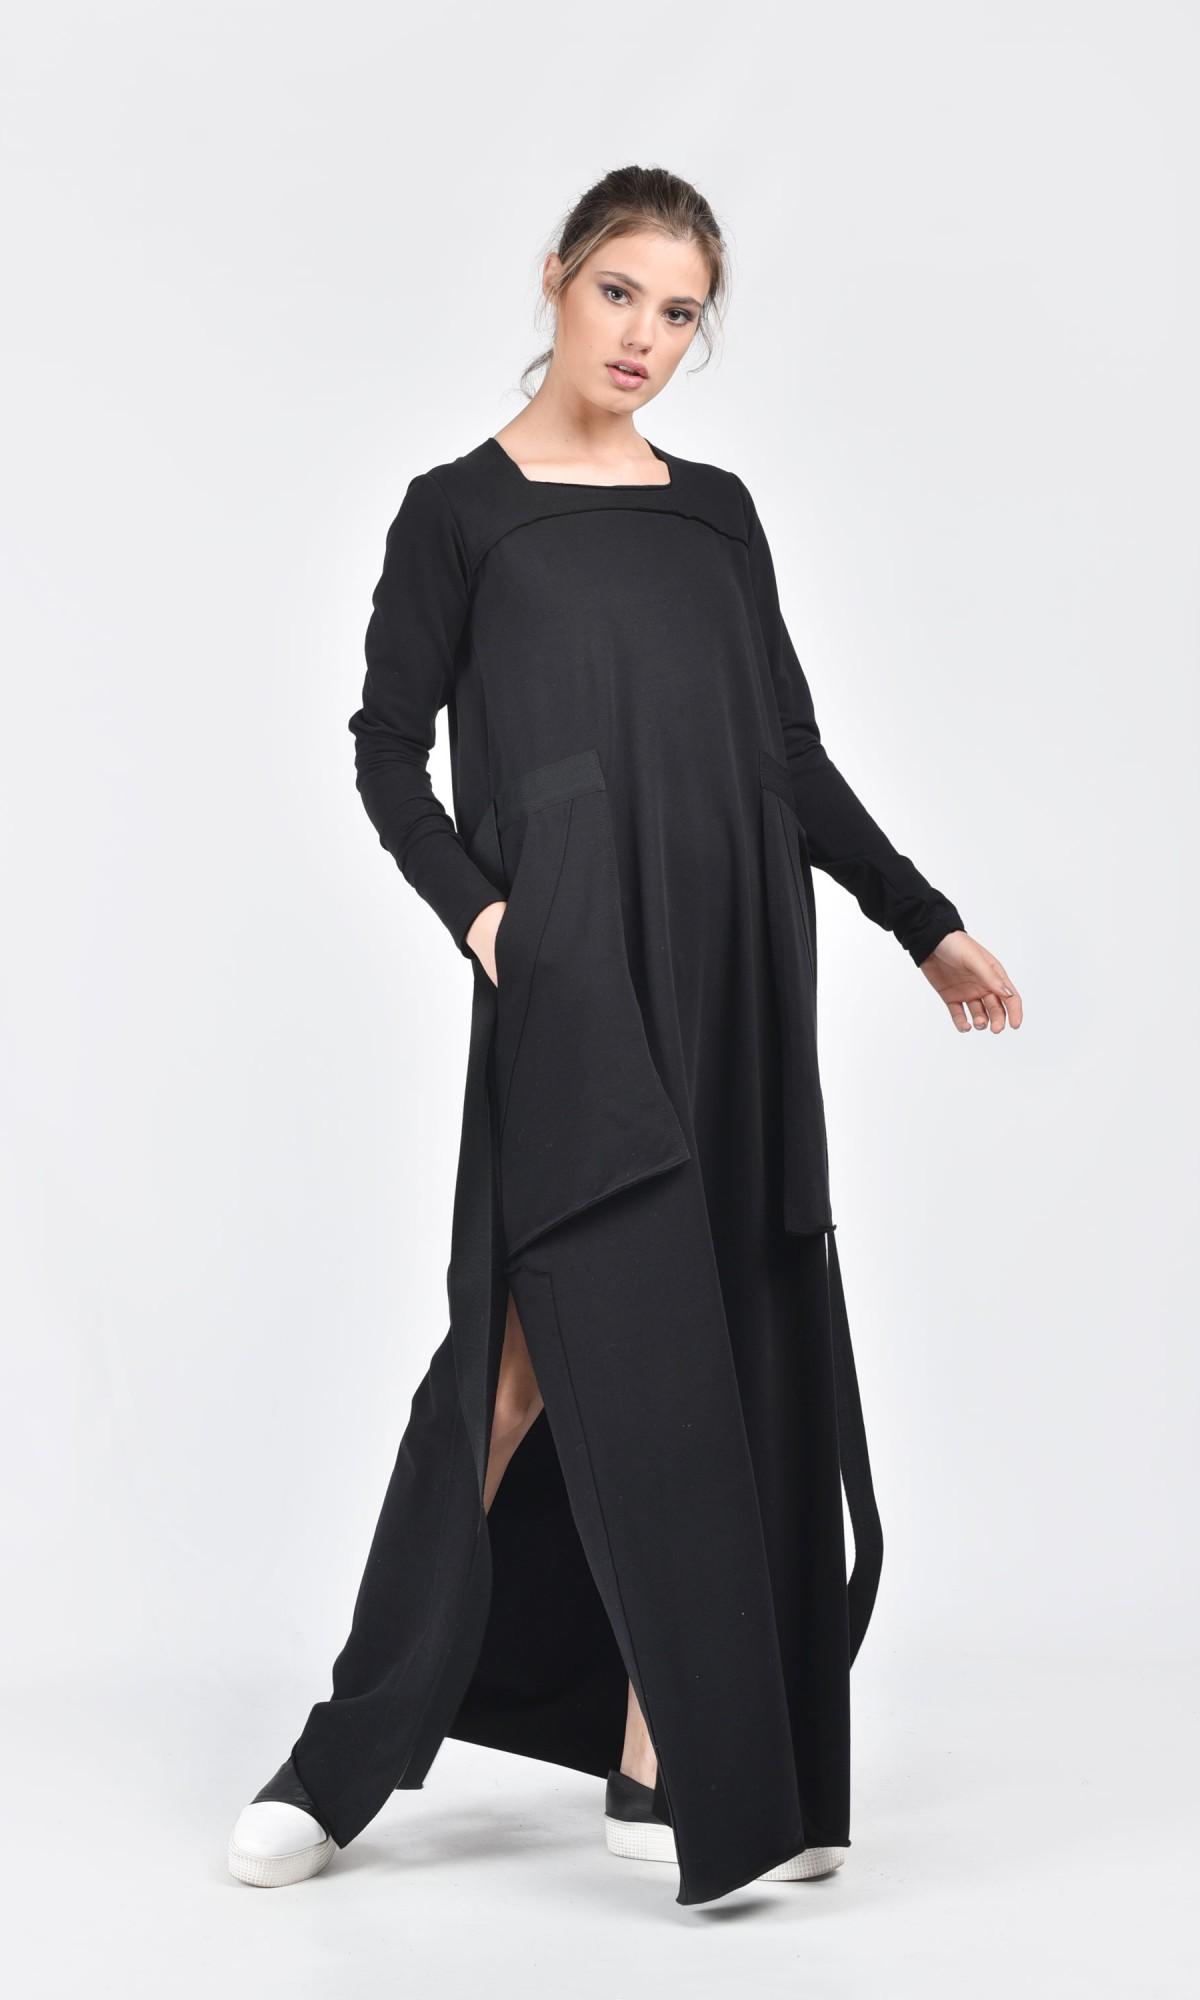 add5b2ee82 -20% Black Maxi Dress with Side Pockets A03464